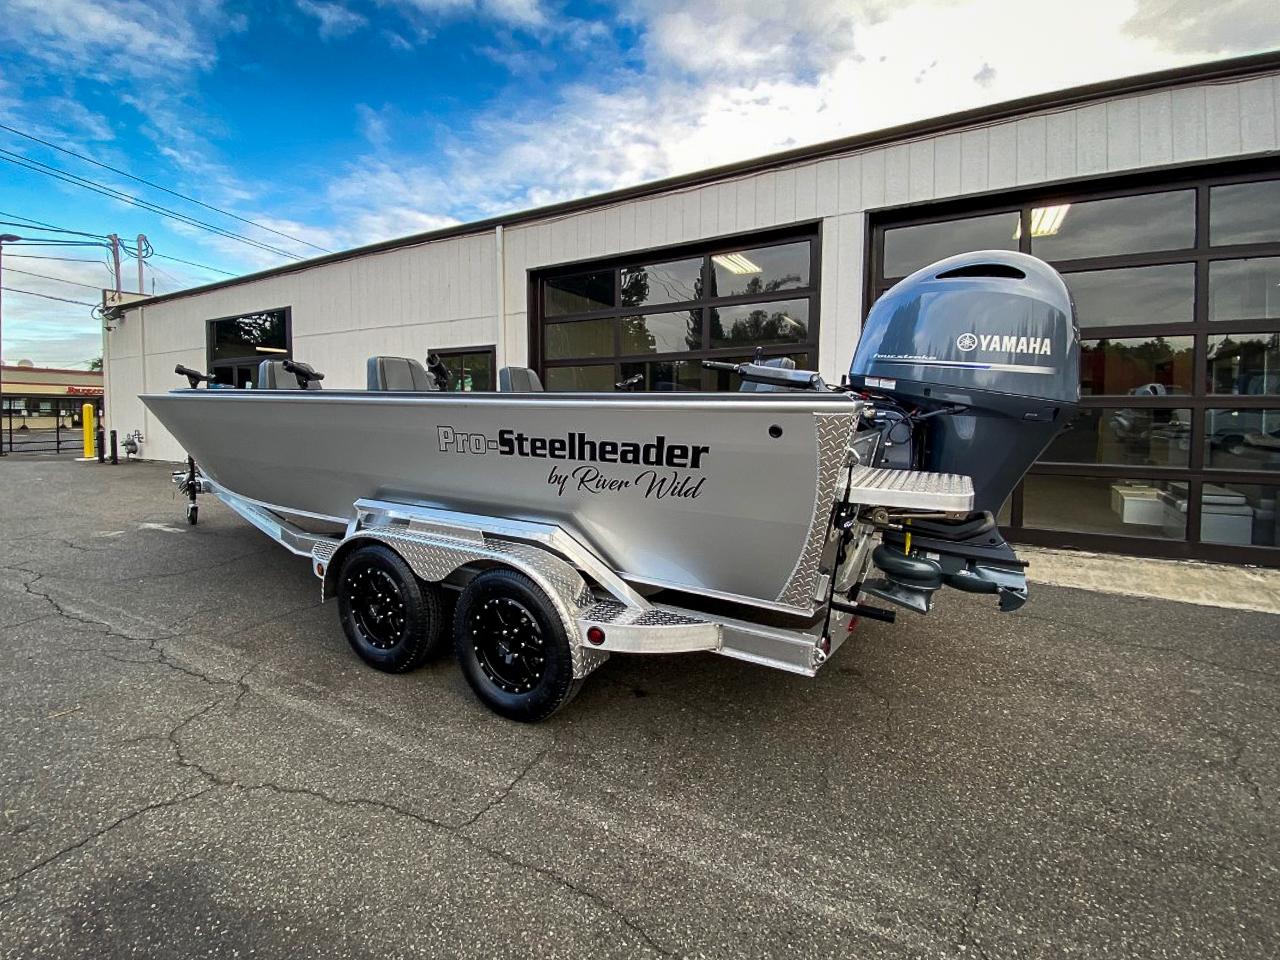 2021 Pro-Steelheader 21X84 Guide Model